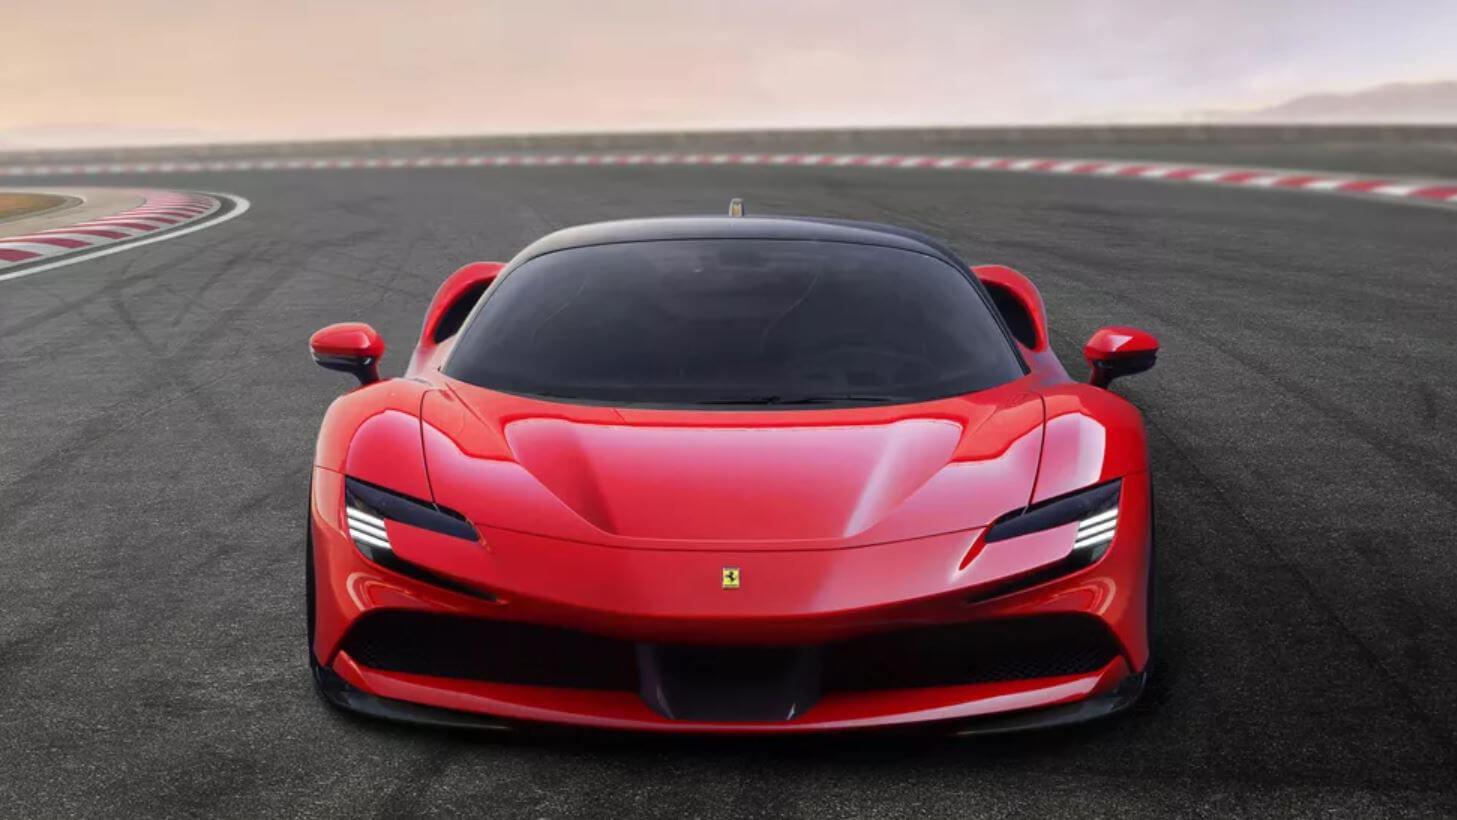 The Future of Modern Sports cars : The all new Ferrari SF90 Stradale